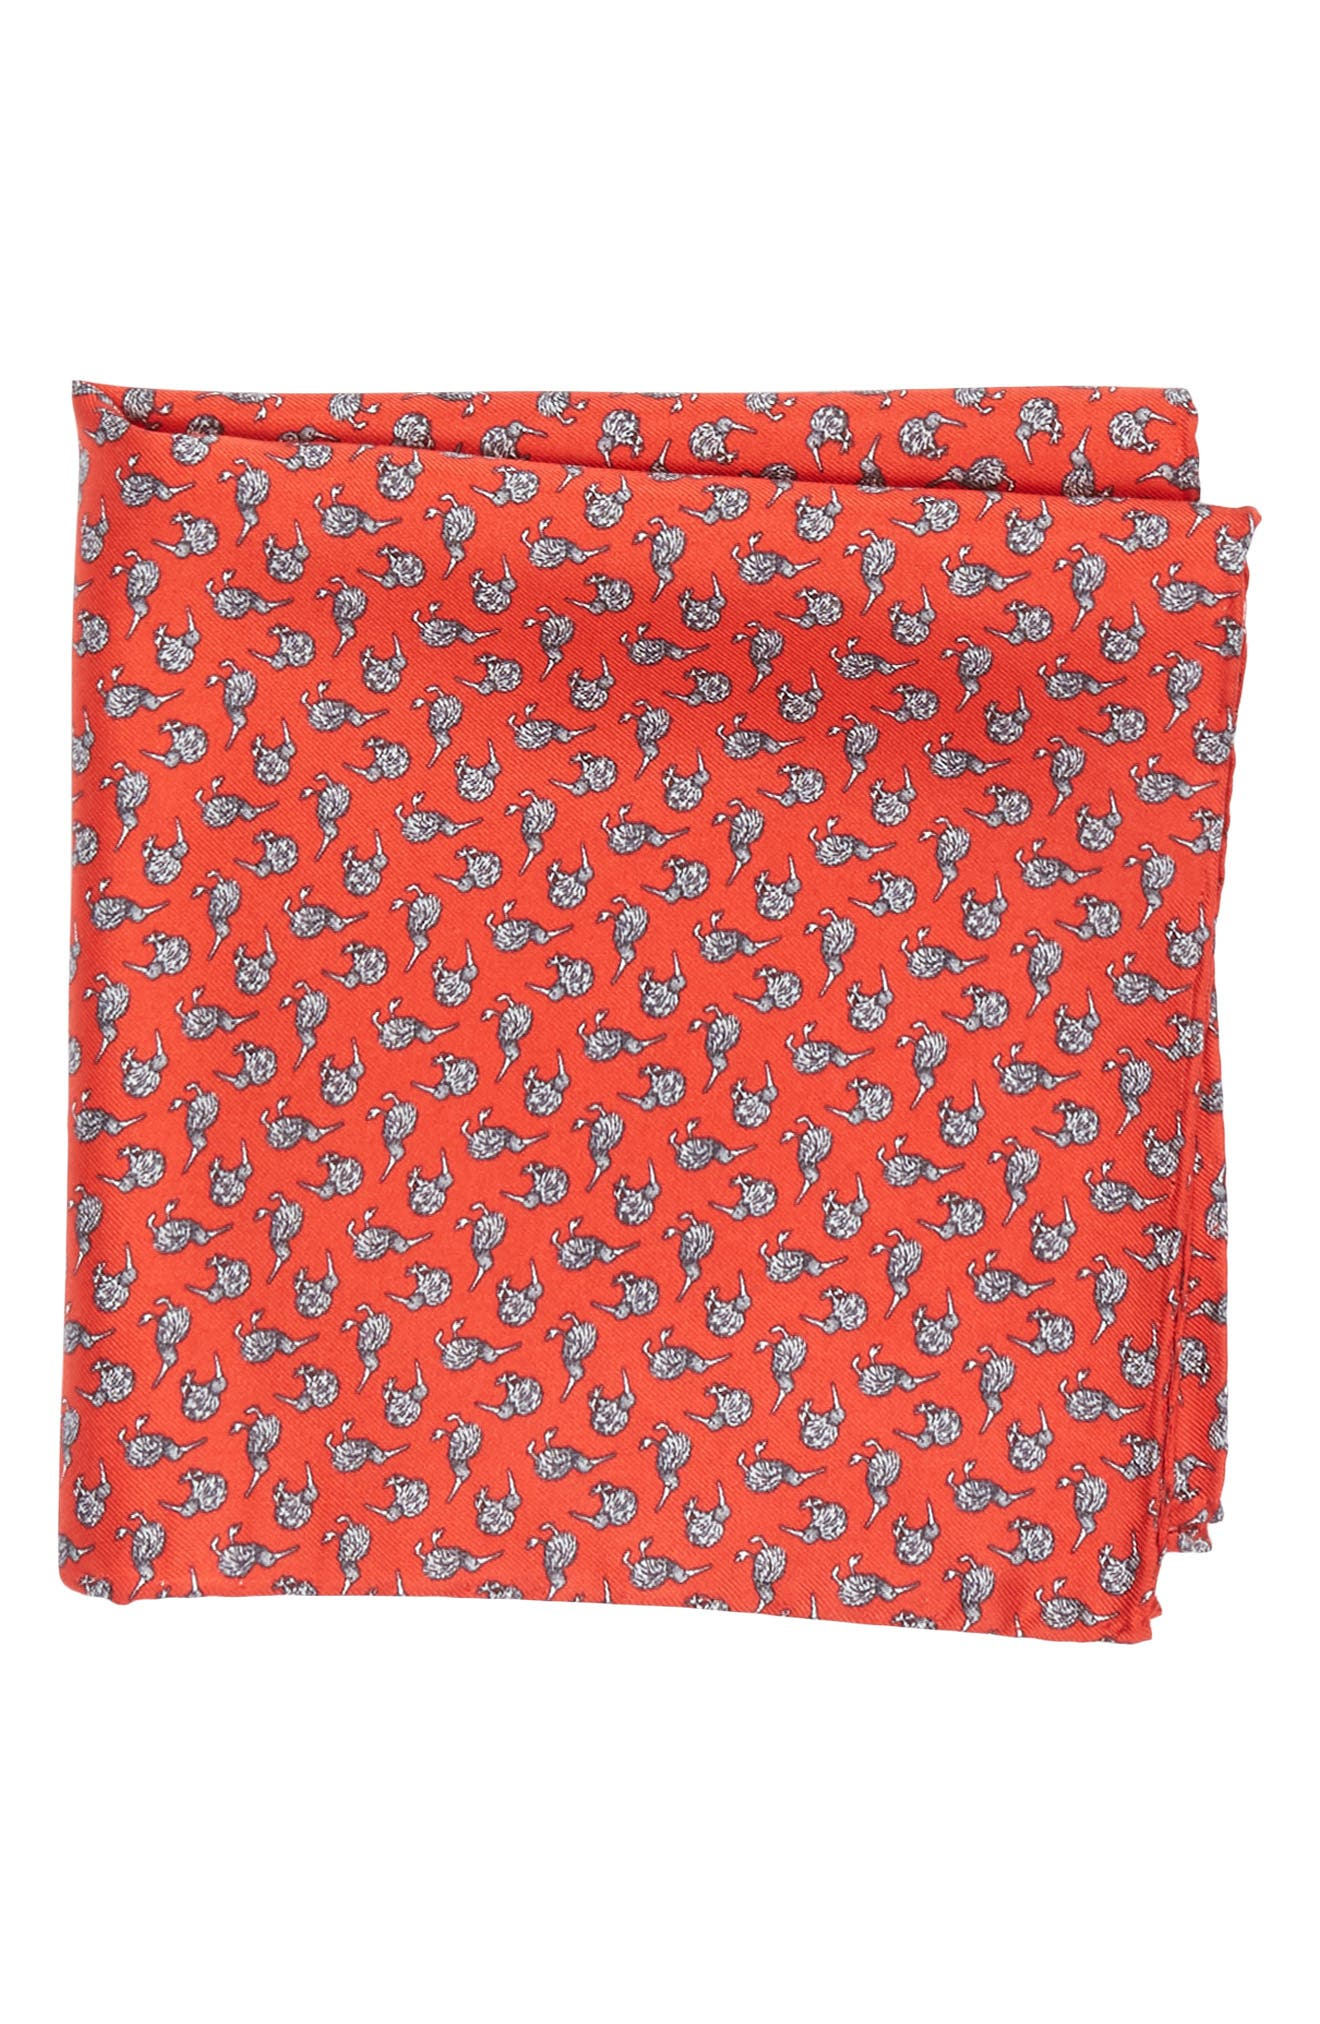 Cheeky Kiwi Silk Pocket Square,                         Main,                         color, Red